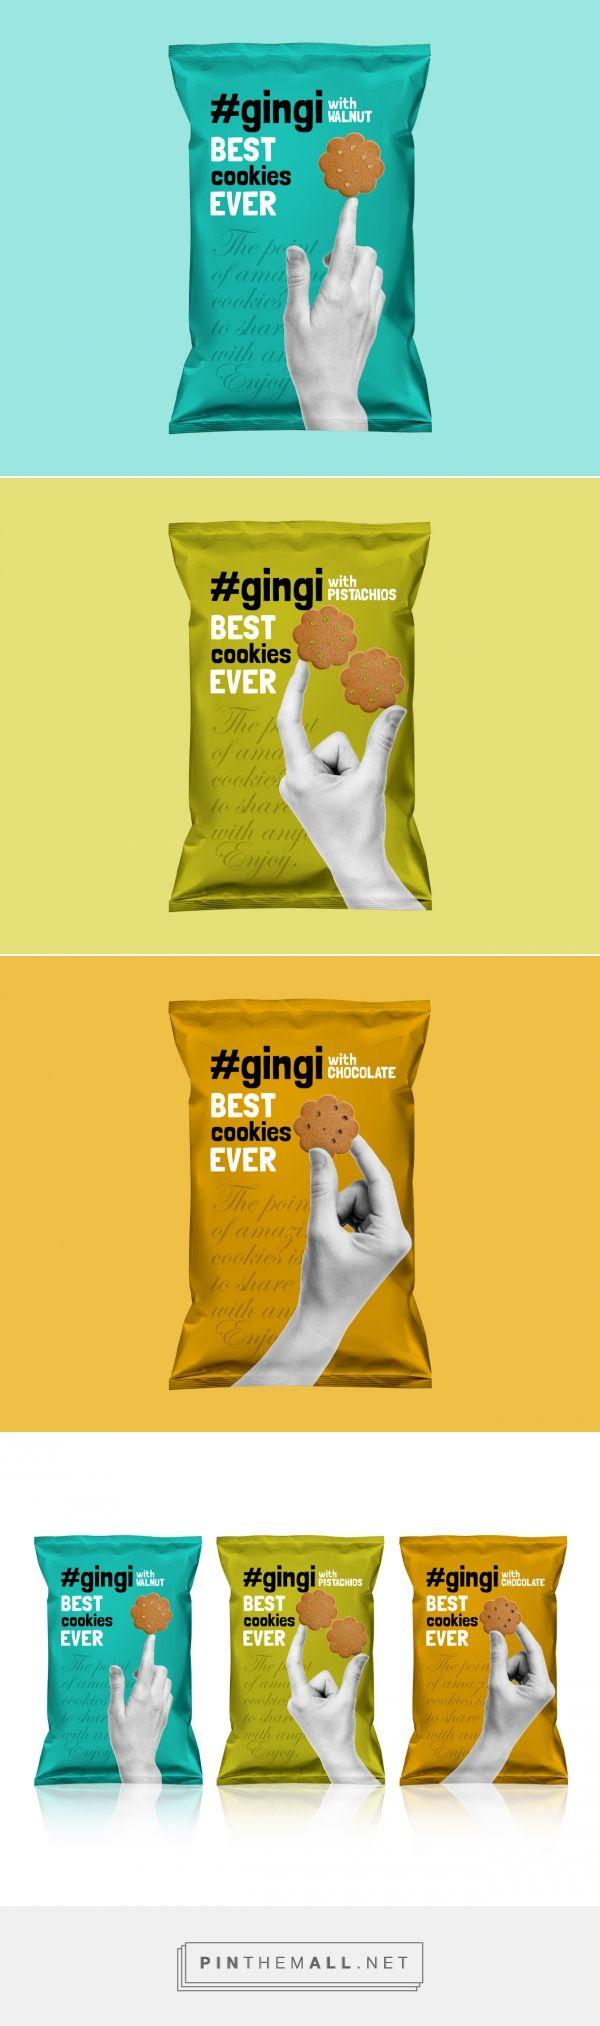 Gingi Cookies Packaging Design | MAISON D'IDÉE - created via http://pinthemall.net